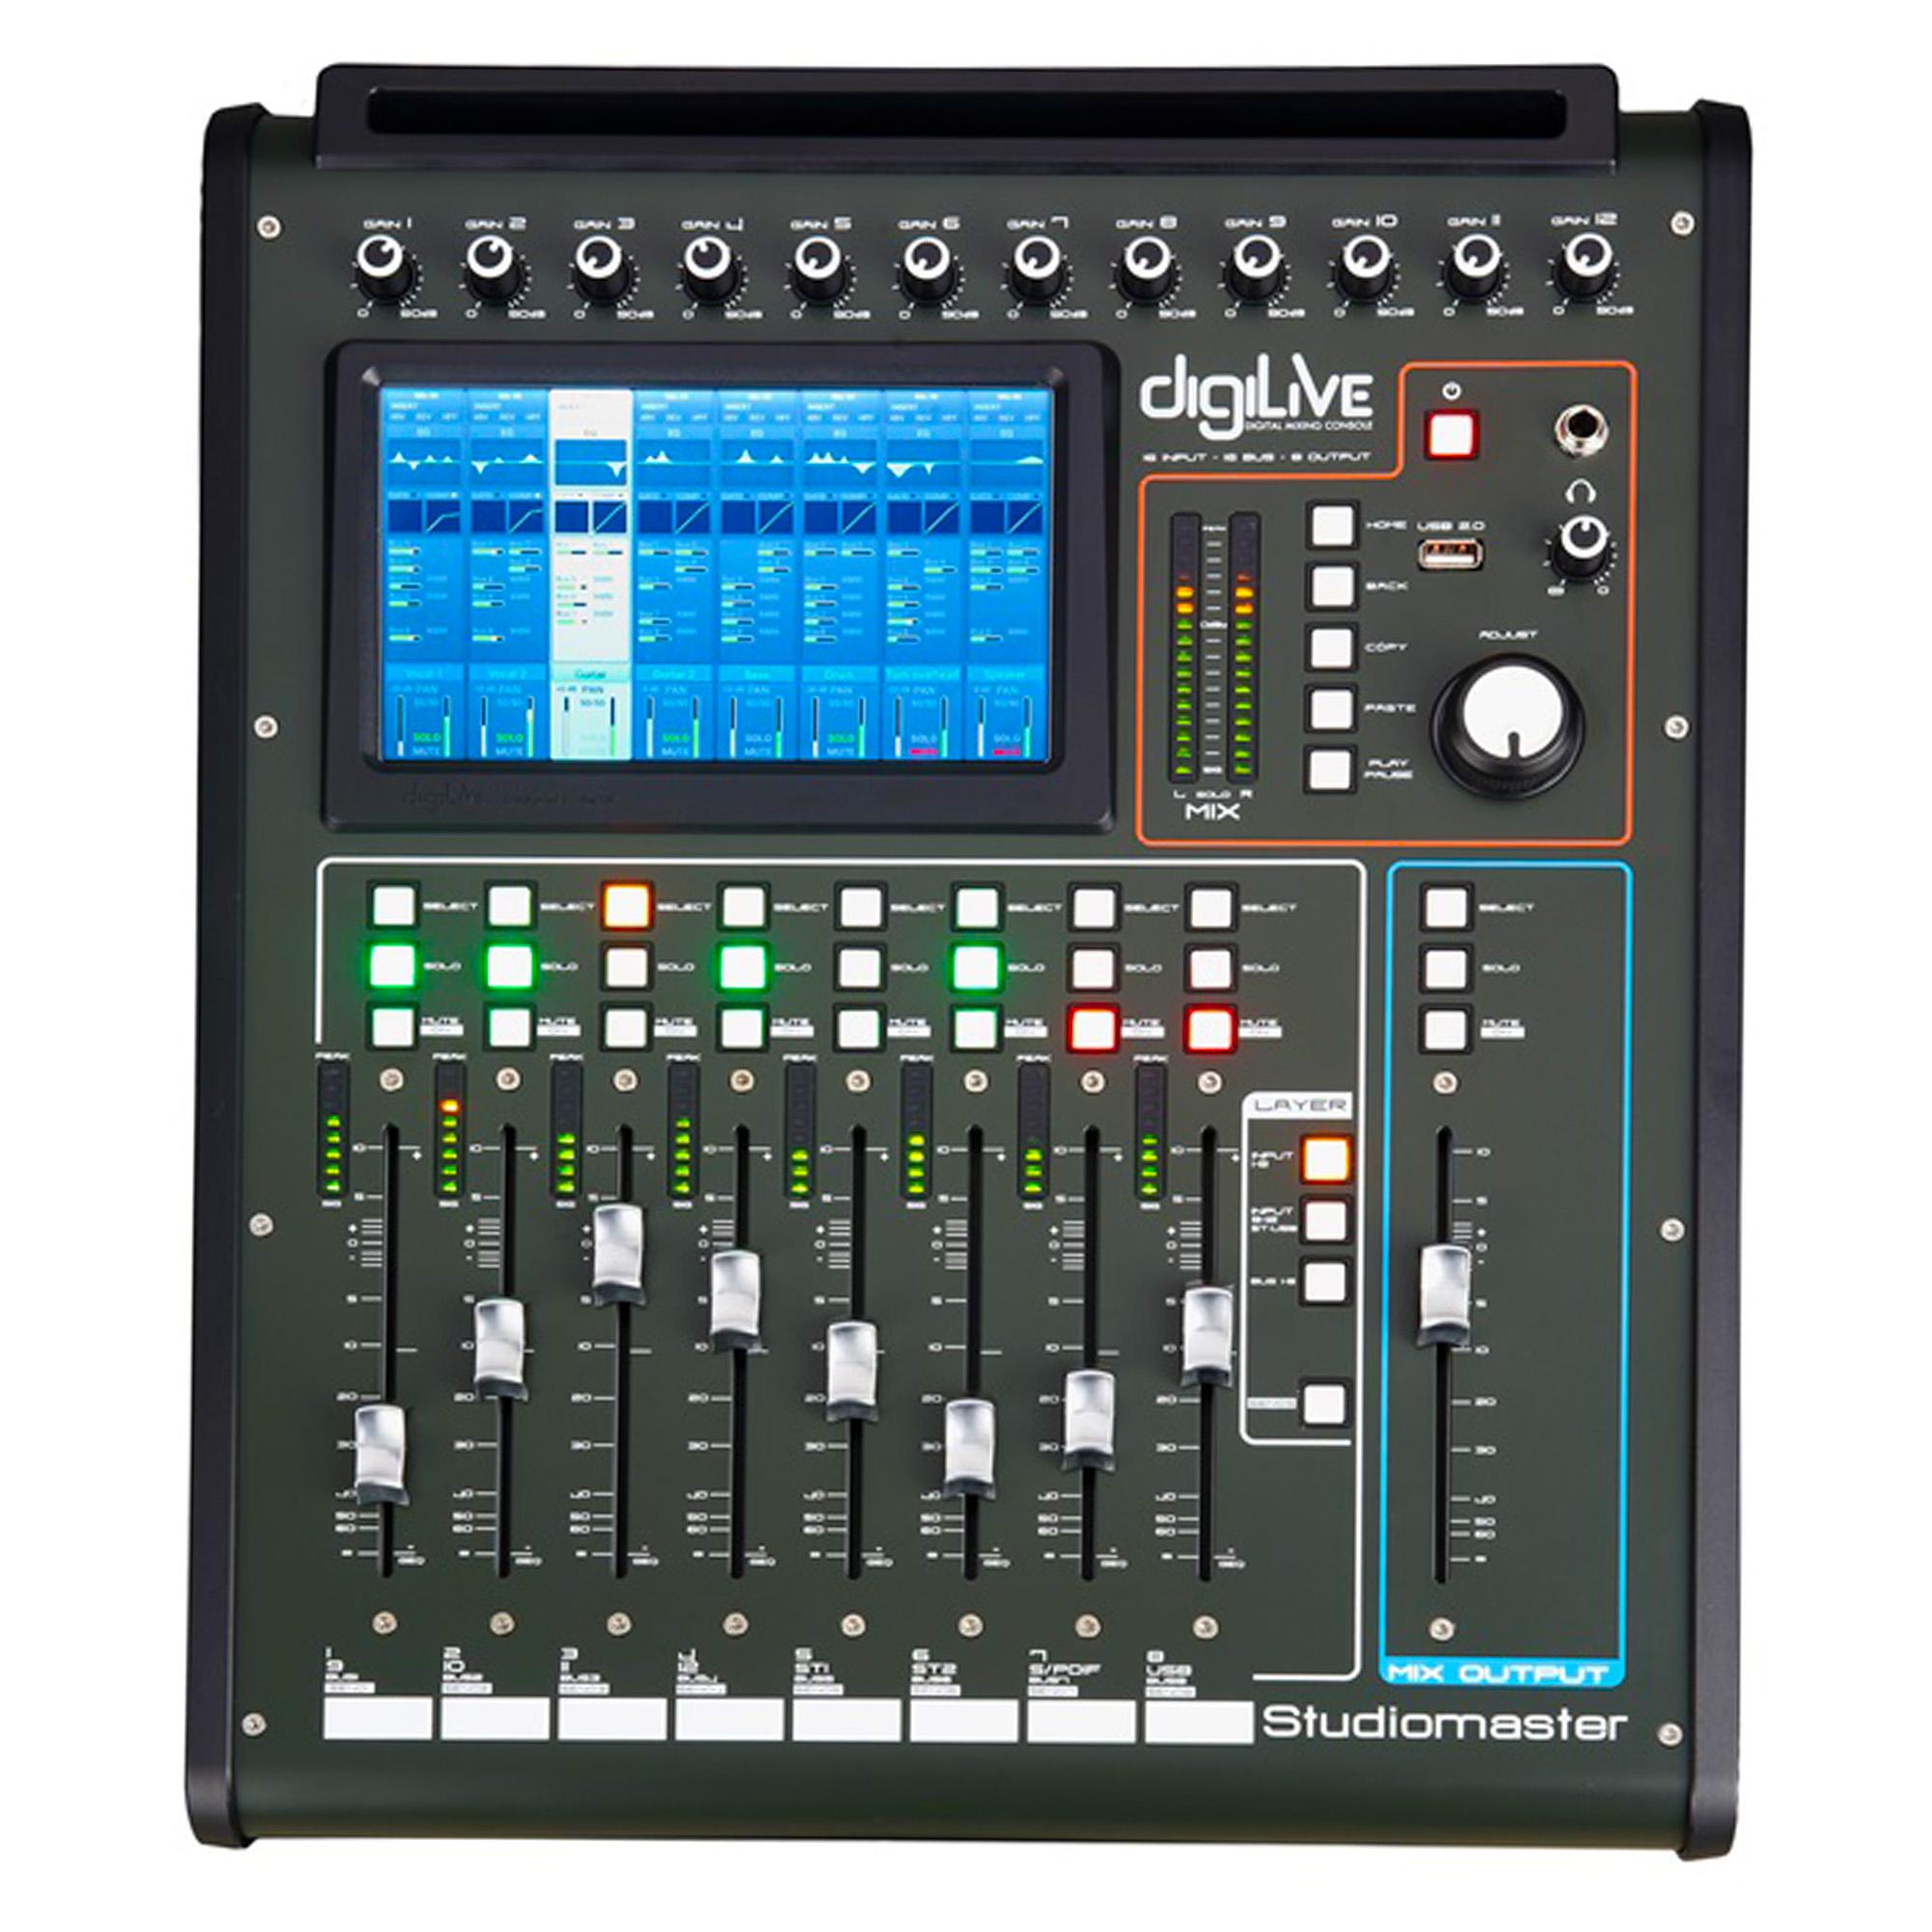 STUDIOMASTER digiLivE 16 20 Input Digital Mixing Console